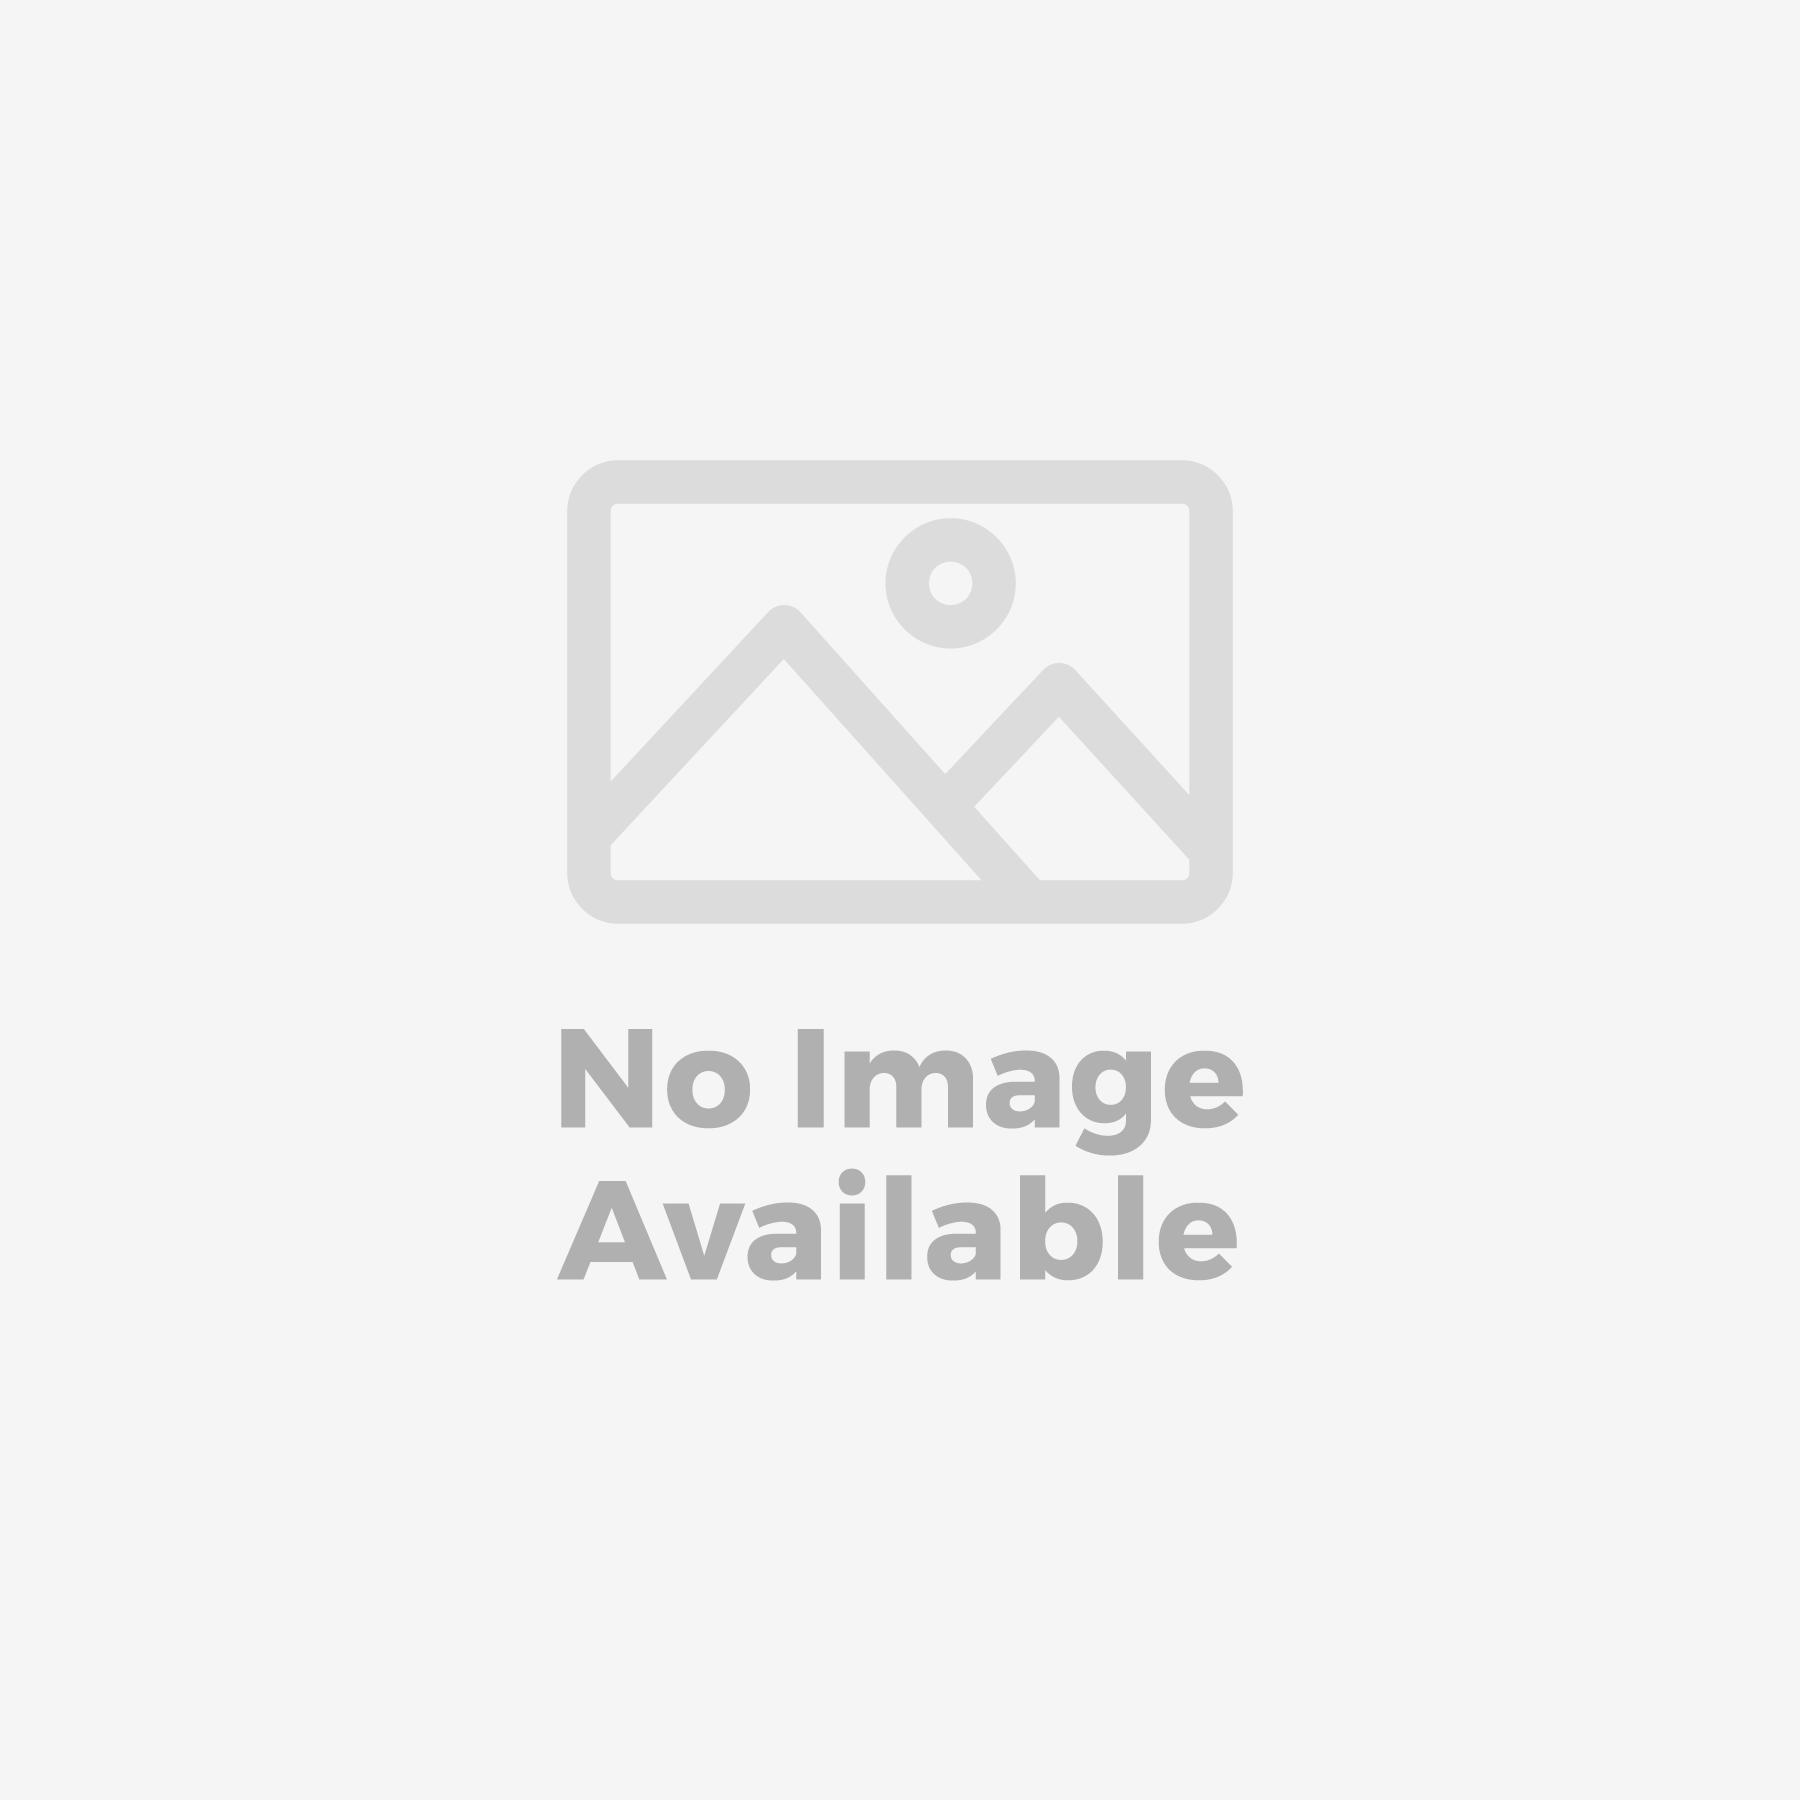 LIGURE - Umbrella - White Finish Pole